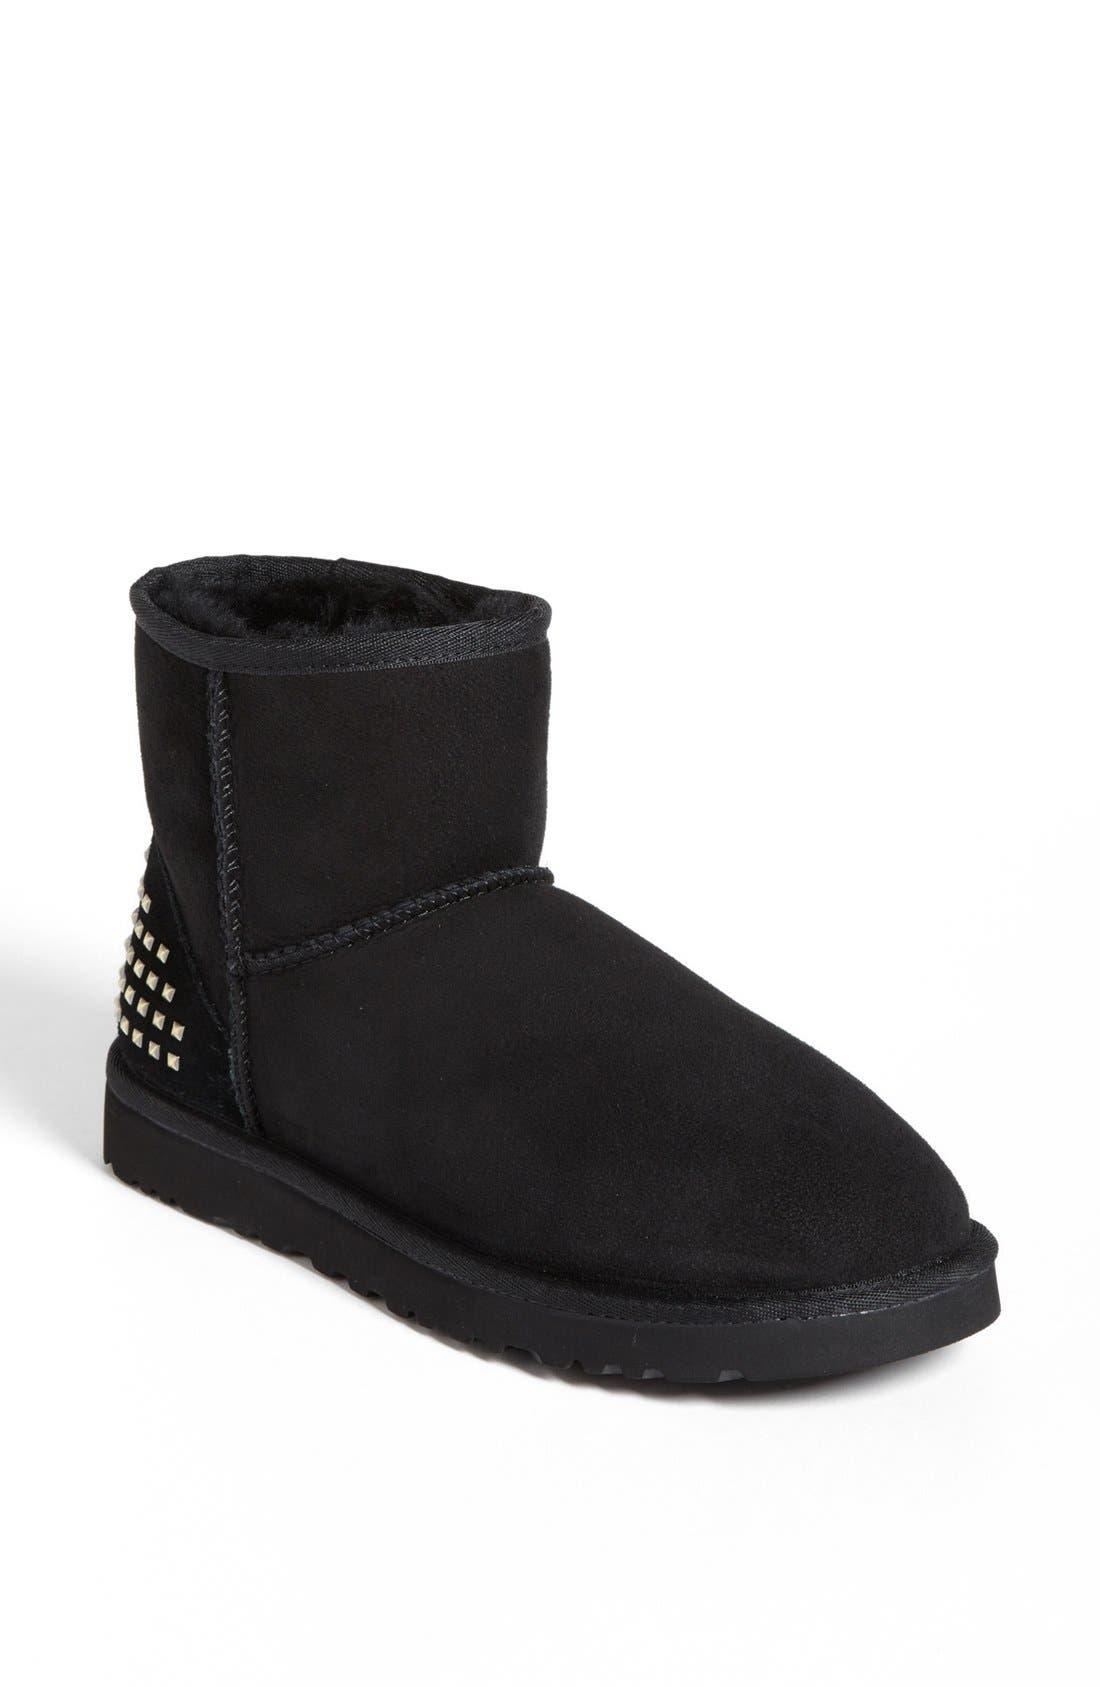 Alternate Image 1 Selected - UGG® Australia 'Classic Mini Studs' Boot (Women)(Nordstrom Exclusive)